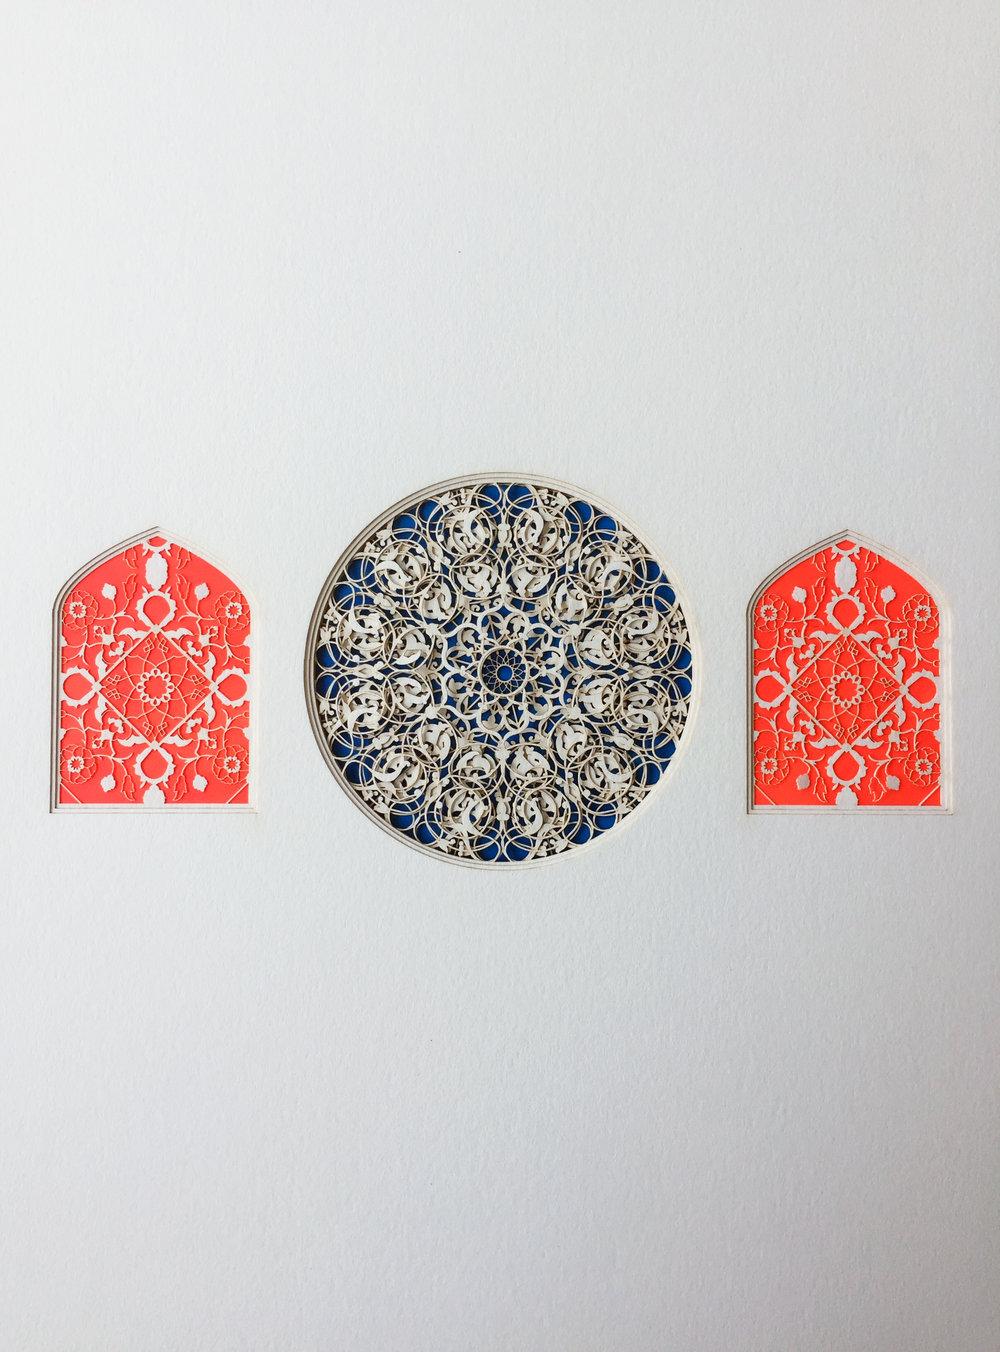 Julia Ibbini,  Thalatha(Circle Studies) , 2017, 19 x 15 x 1.5 inches framed, photo courtesy of the artist